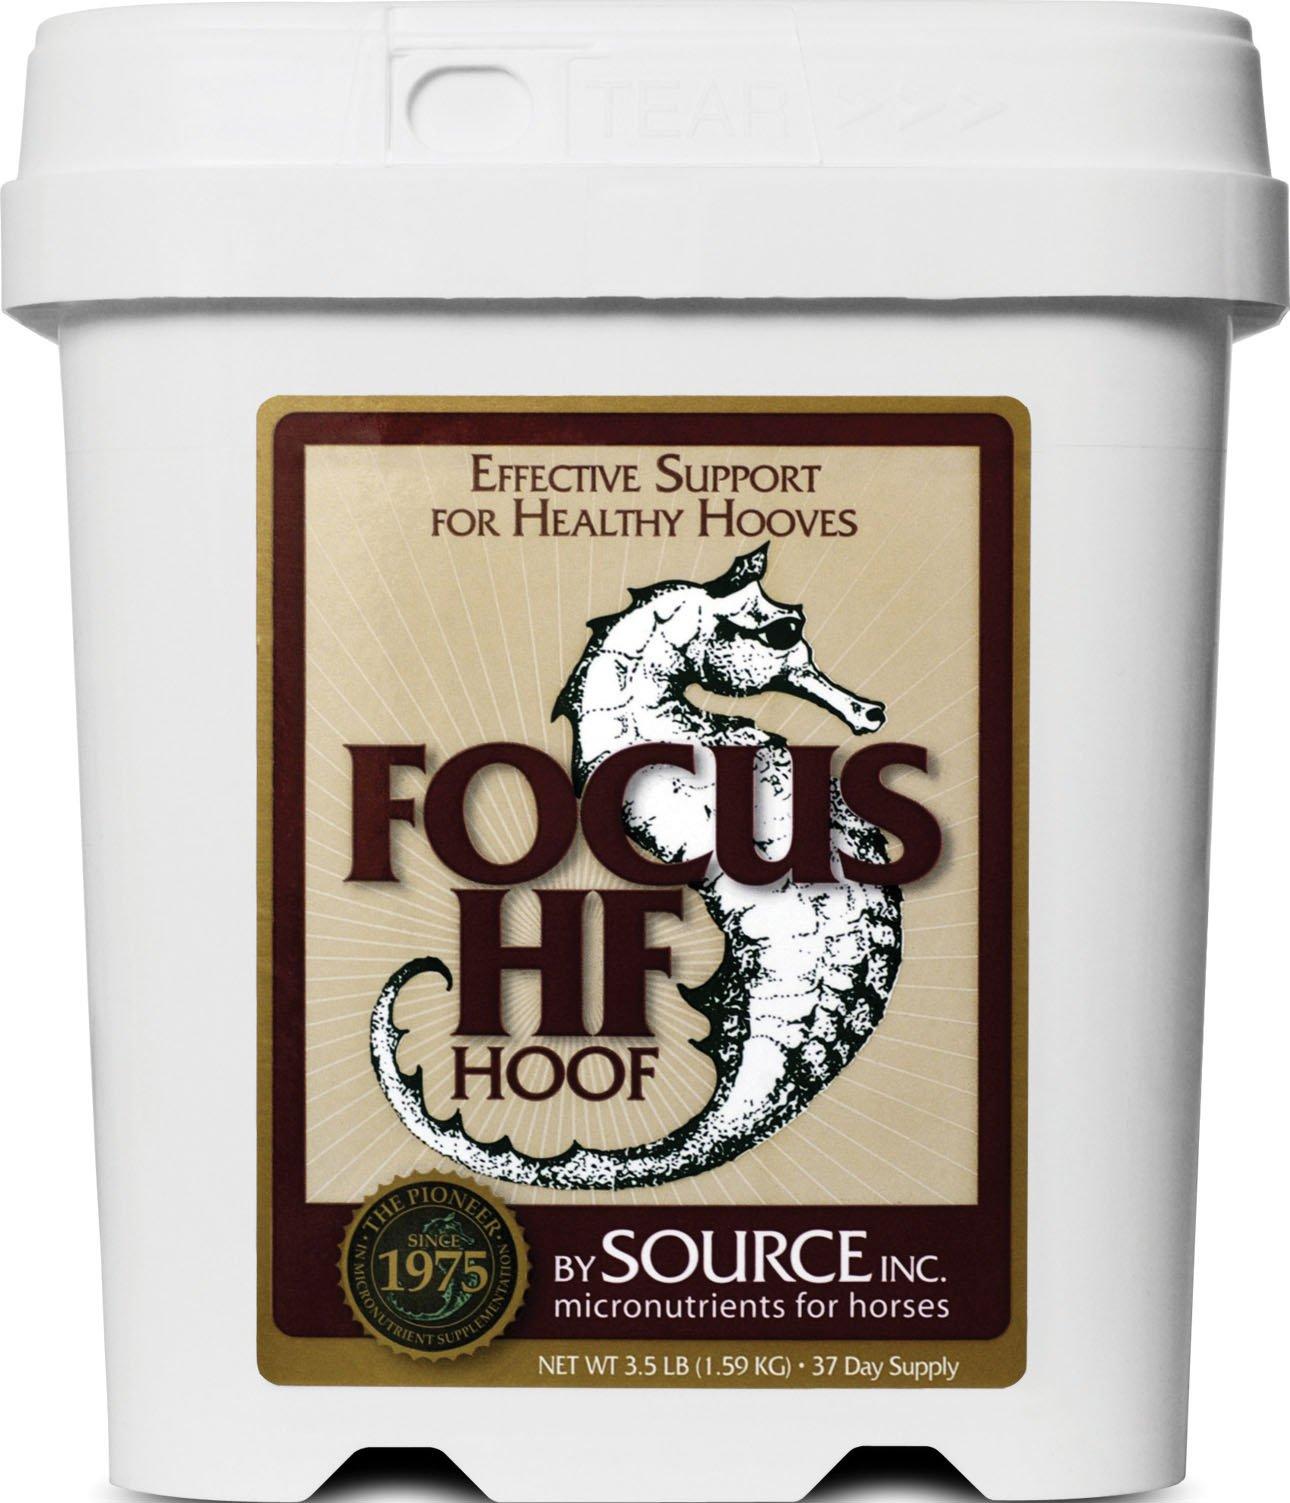 SOURCE 573935 Focus Hf Hoof micronutrient for Horses, 3.5 lb